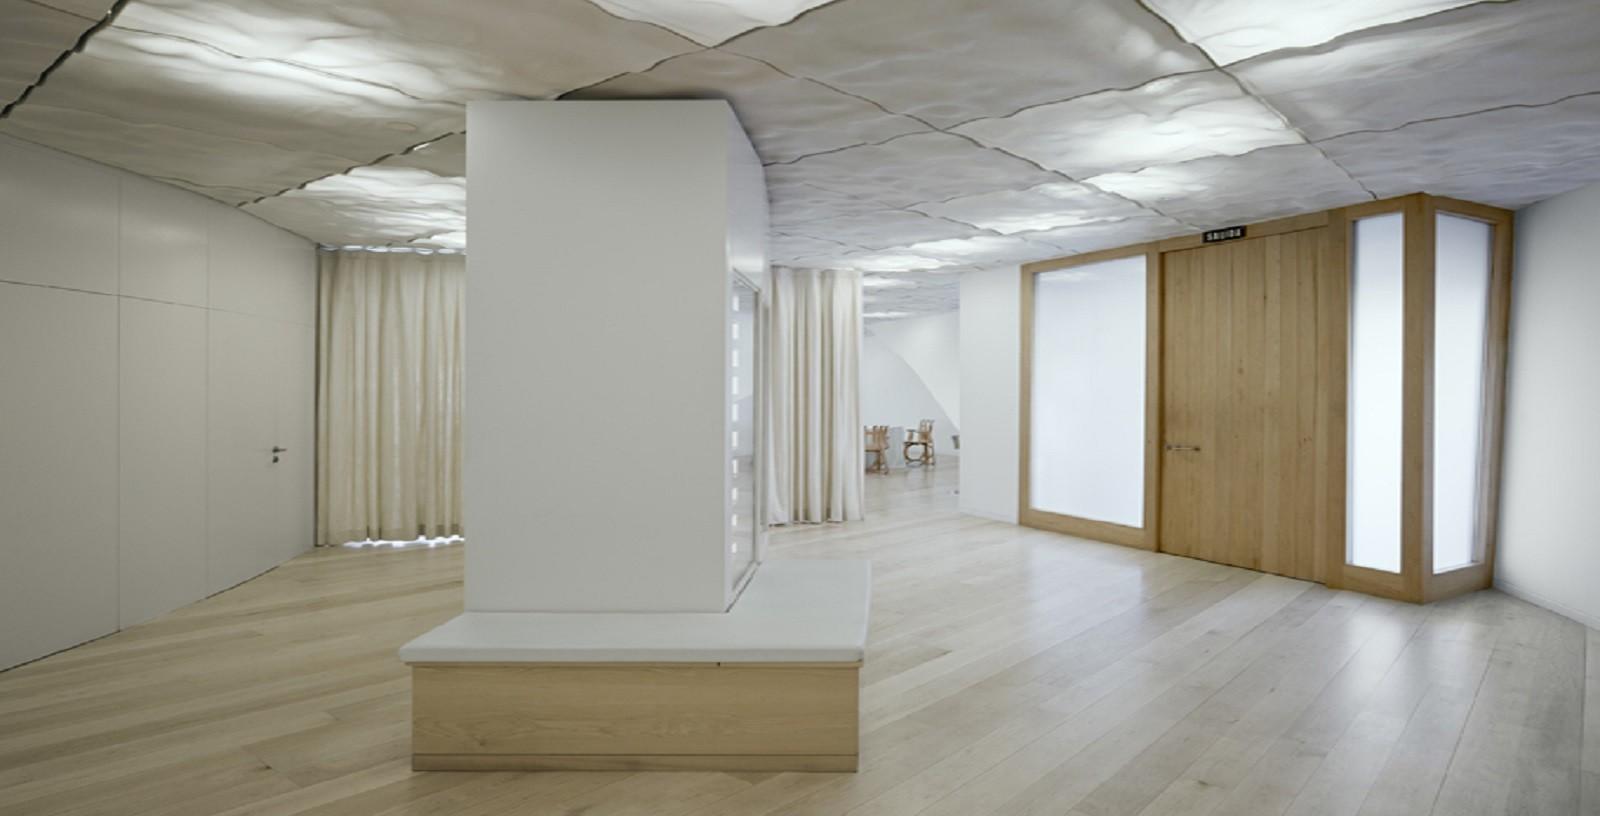 Restaurant_at_the_Guggenheim_Museum_02_Architecture_IDOM_Copyright